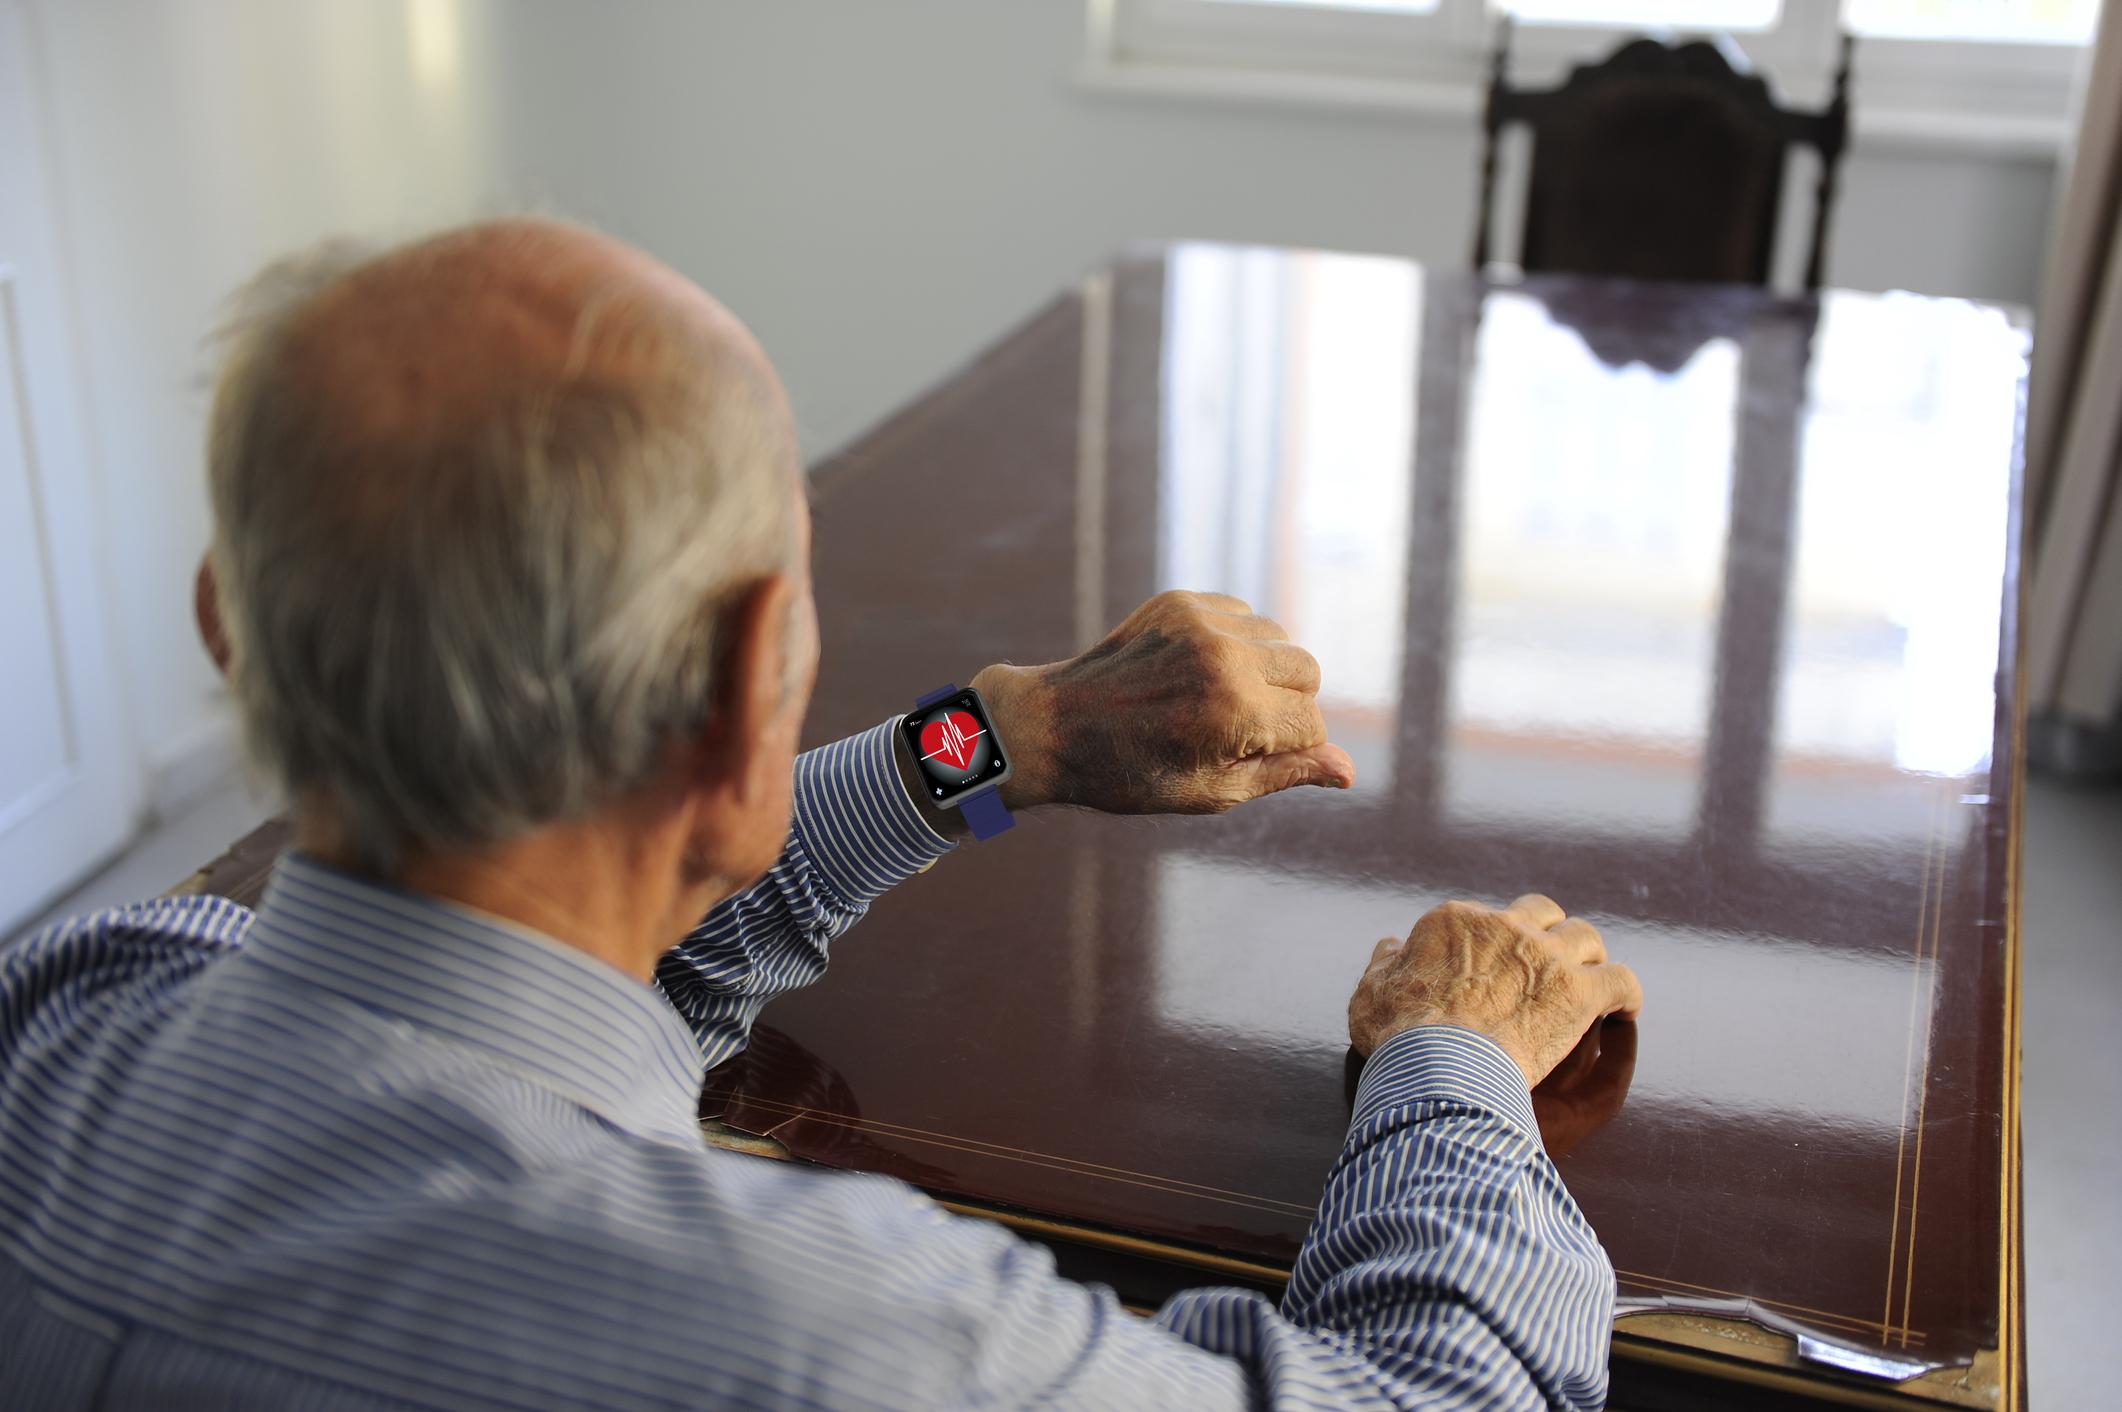 Hacking heart rate monitors